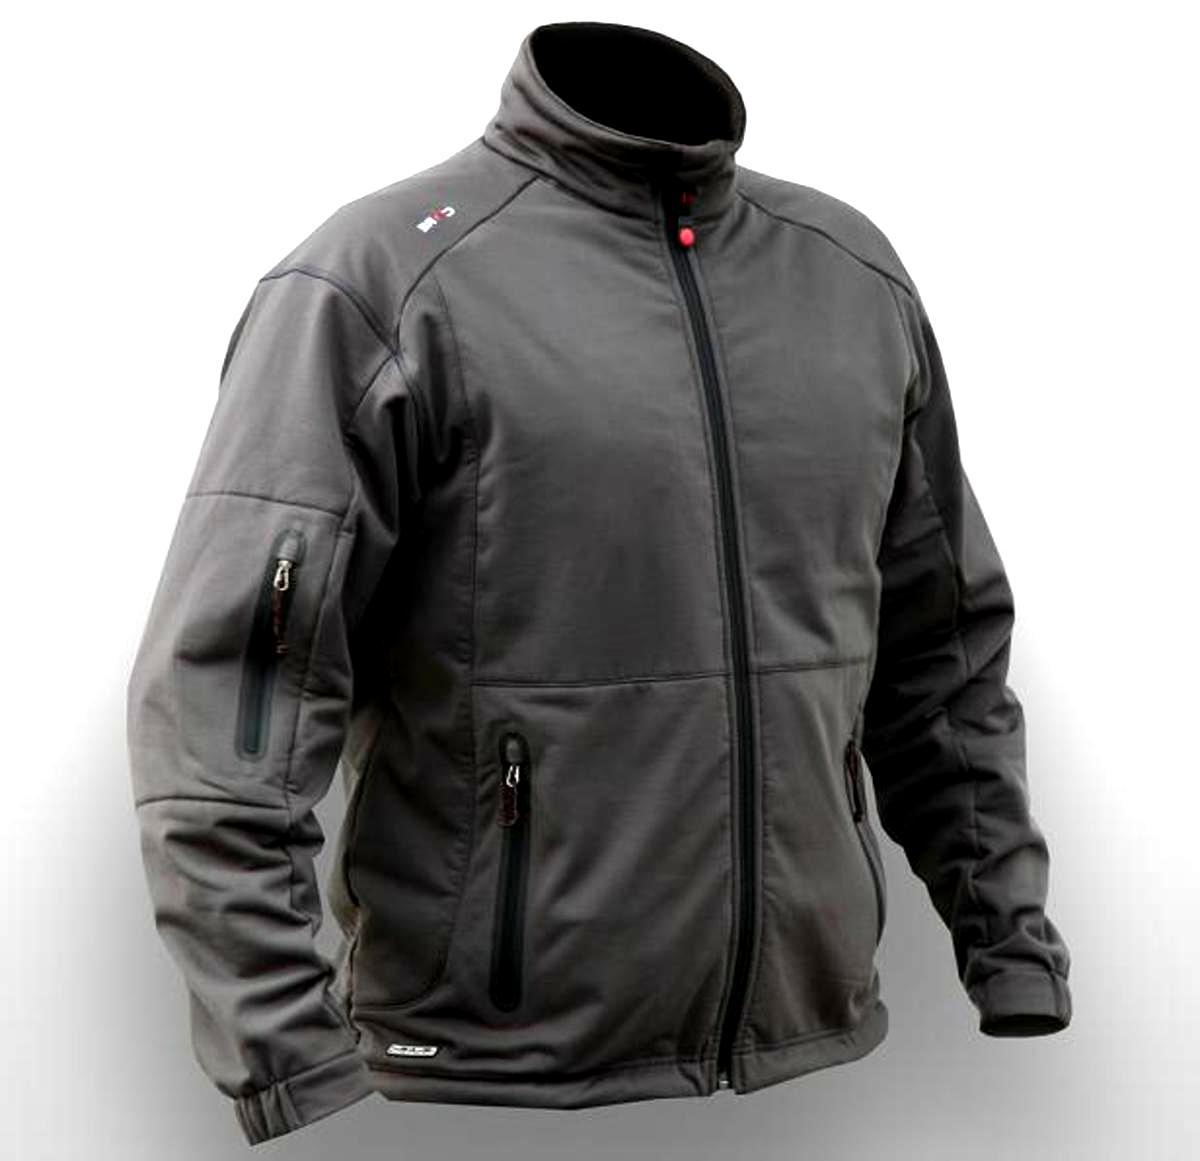 Gerbing Heated Clothing Soft Shell 7V Men's Black Jacket Size MEDIUM